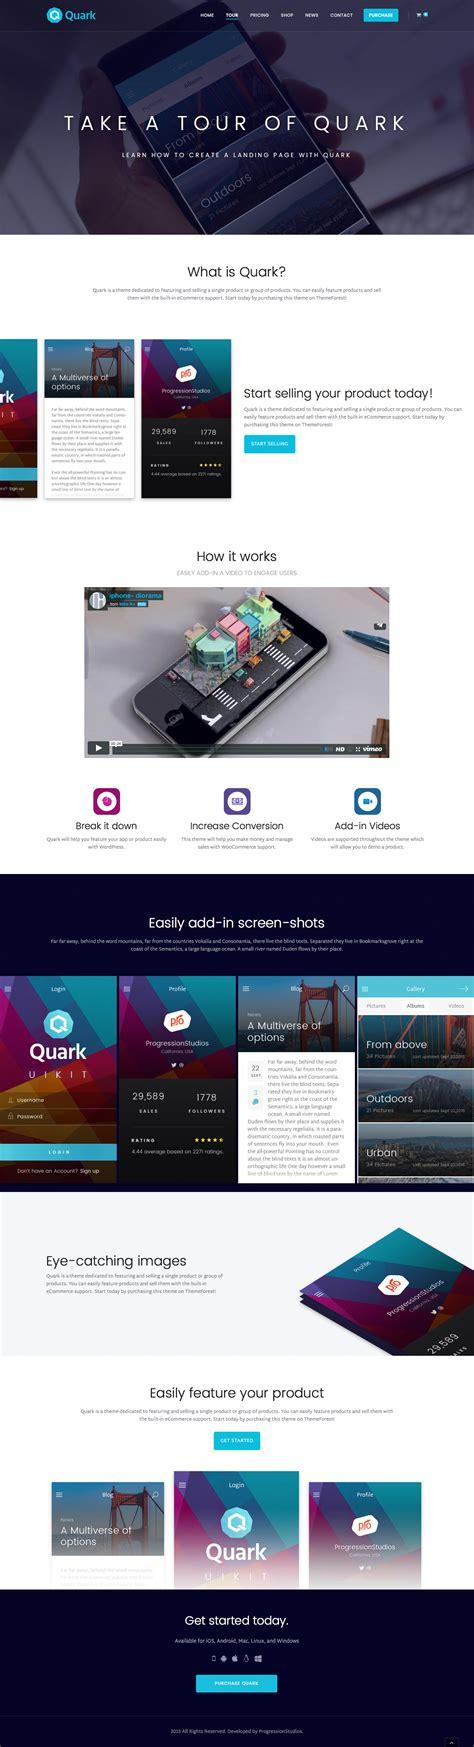 theme wordpress quark quark single product ecommerce theme by